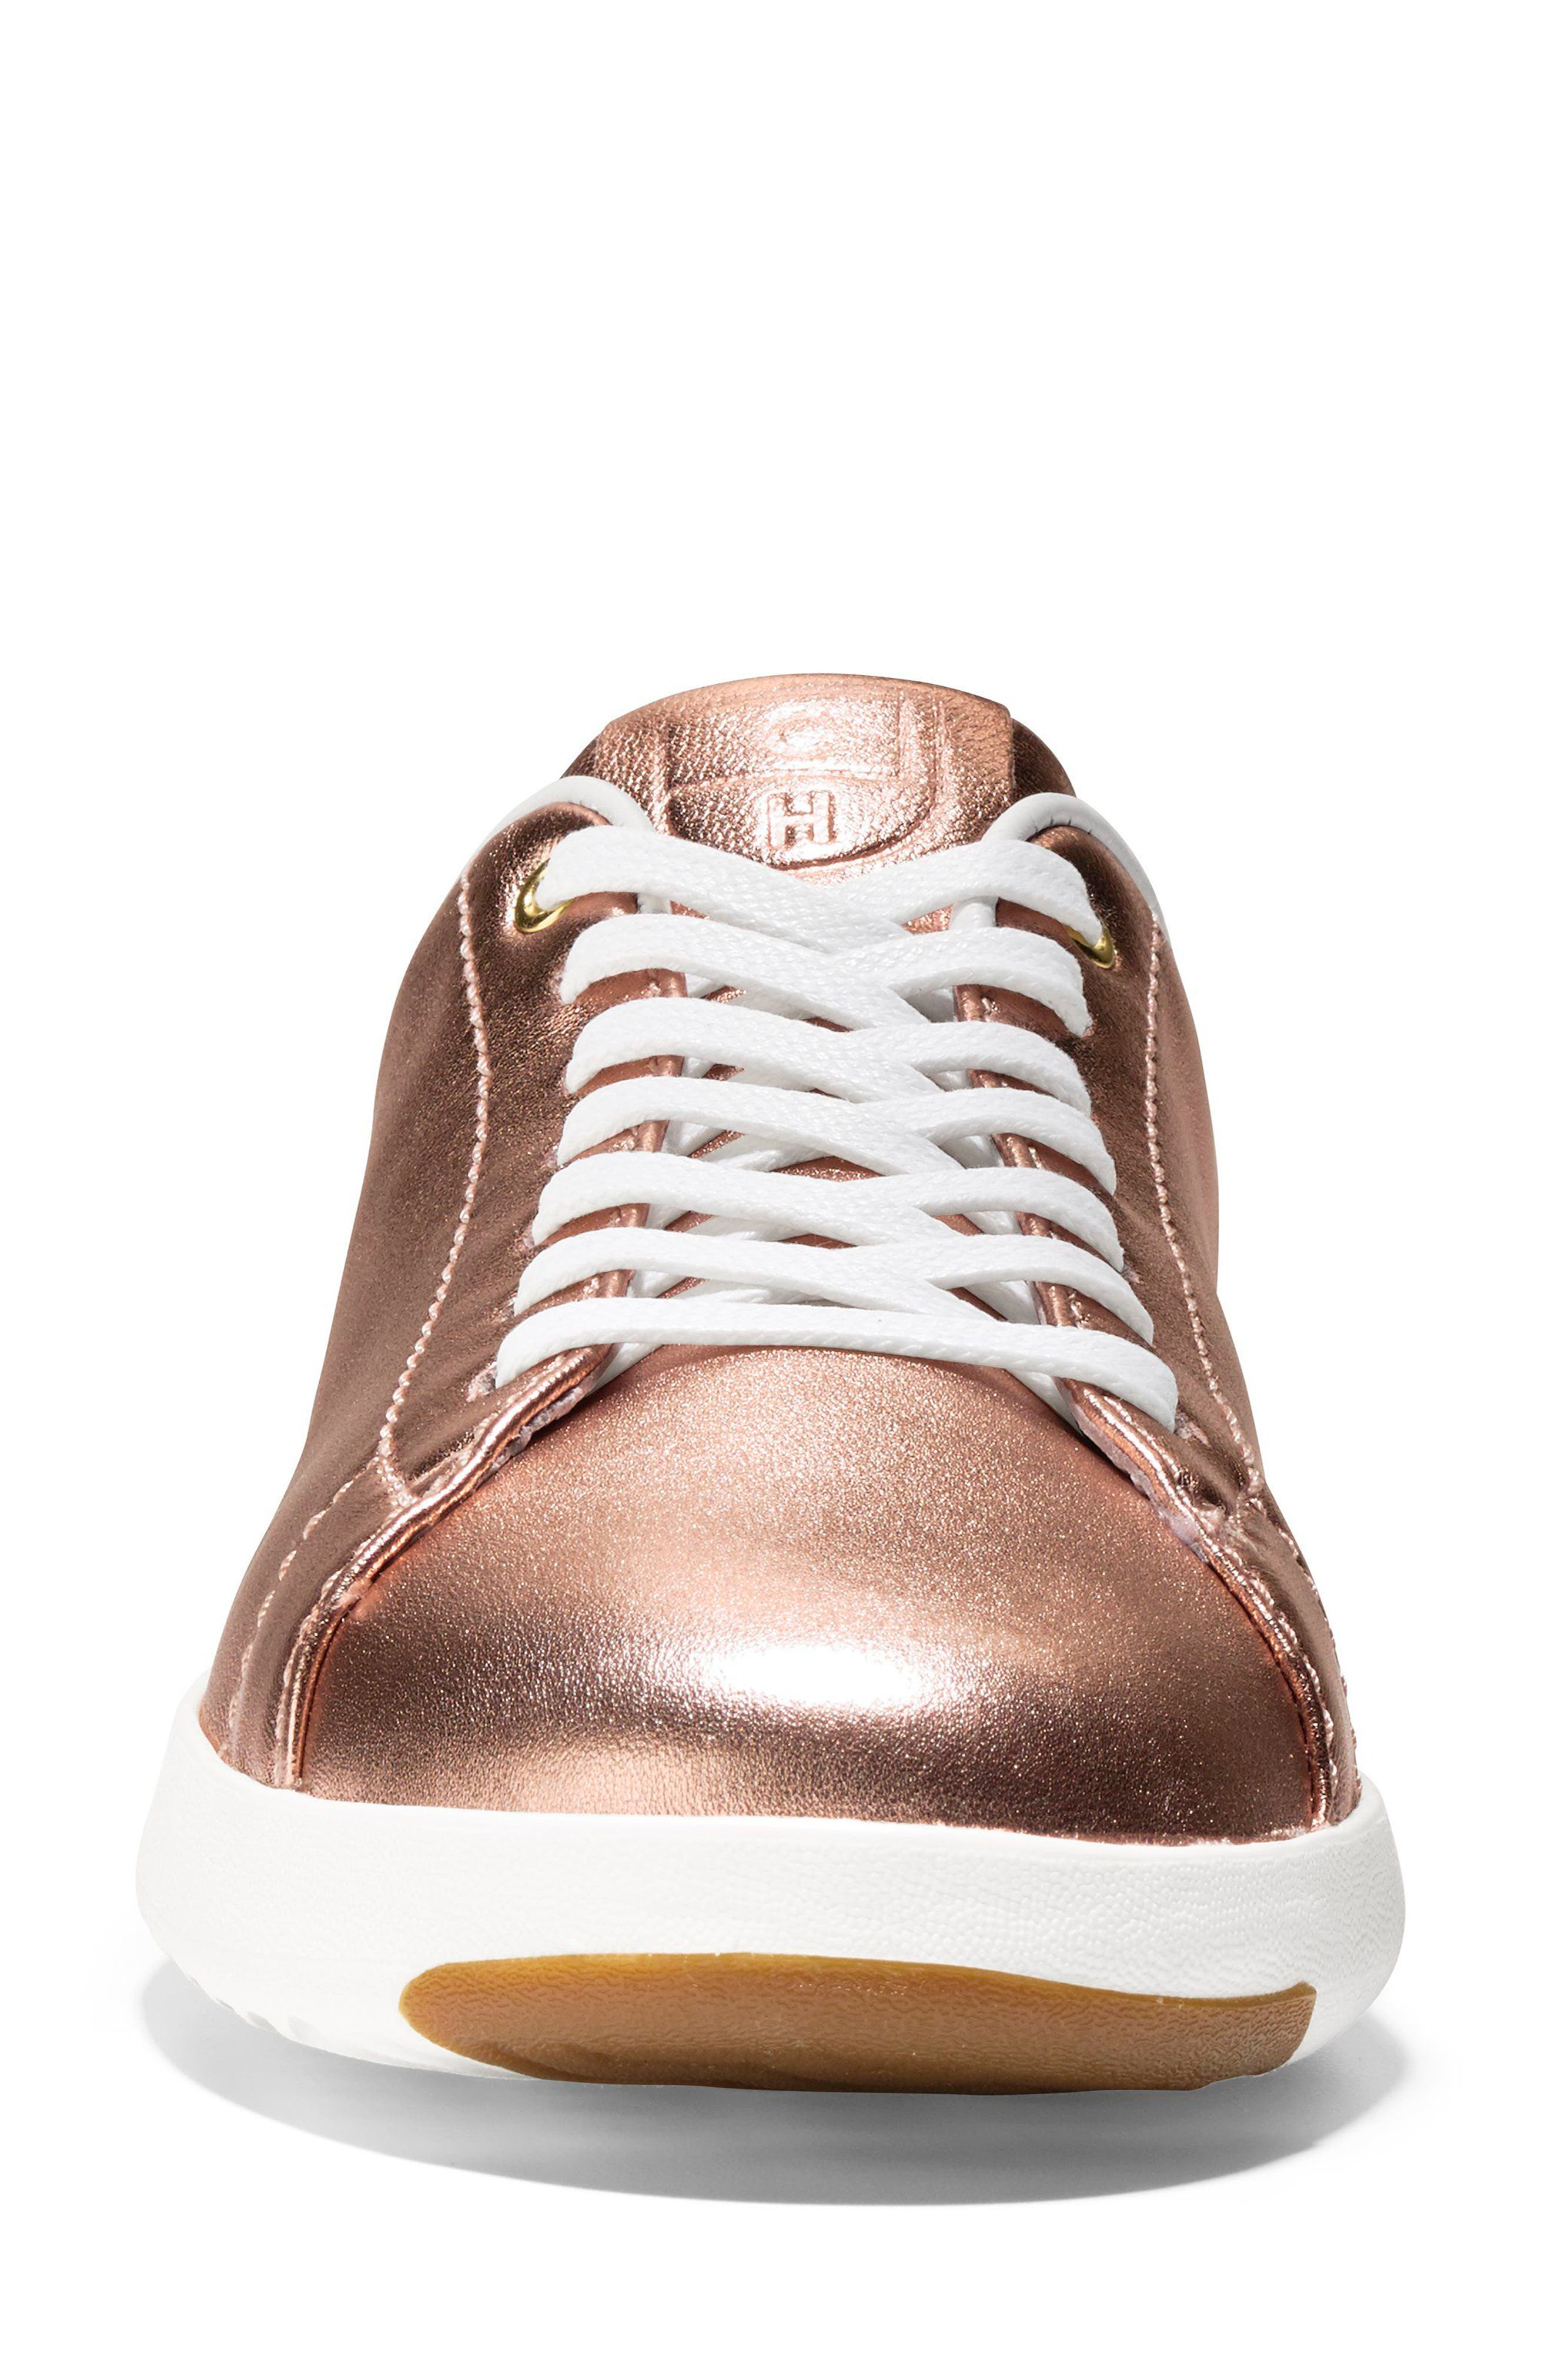 GrandPro Tennis Shoe,                             Alternate thumbnail 4, color,                             Rose Gold Leather